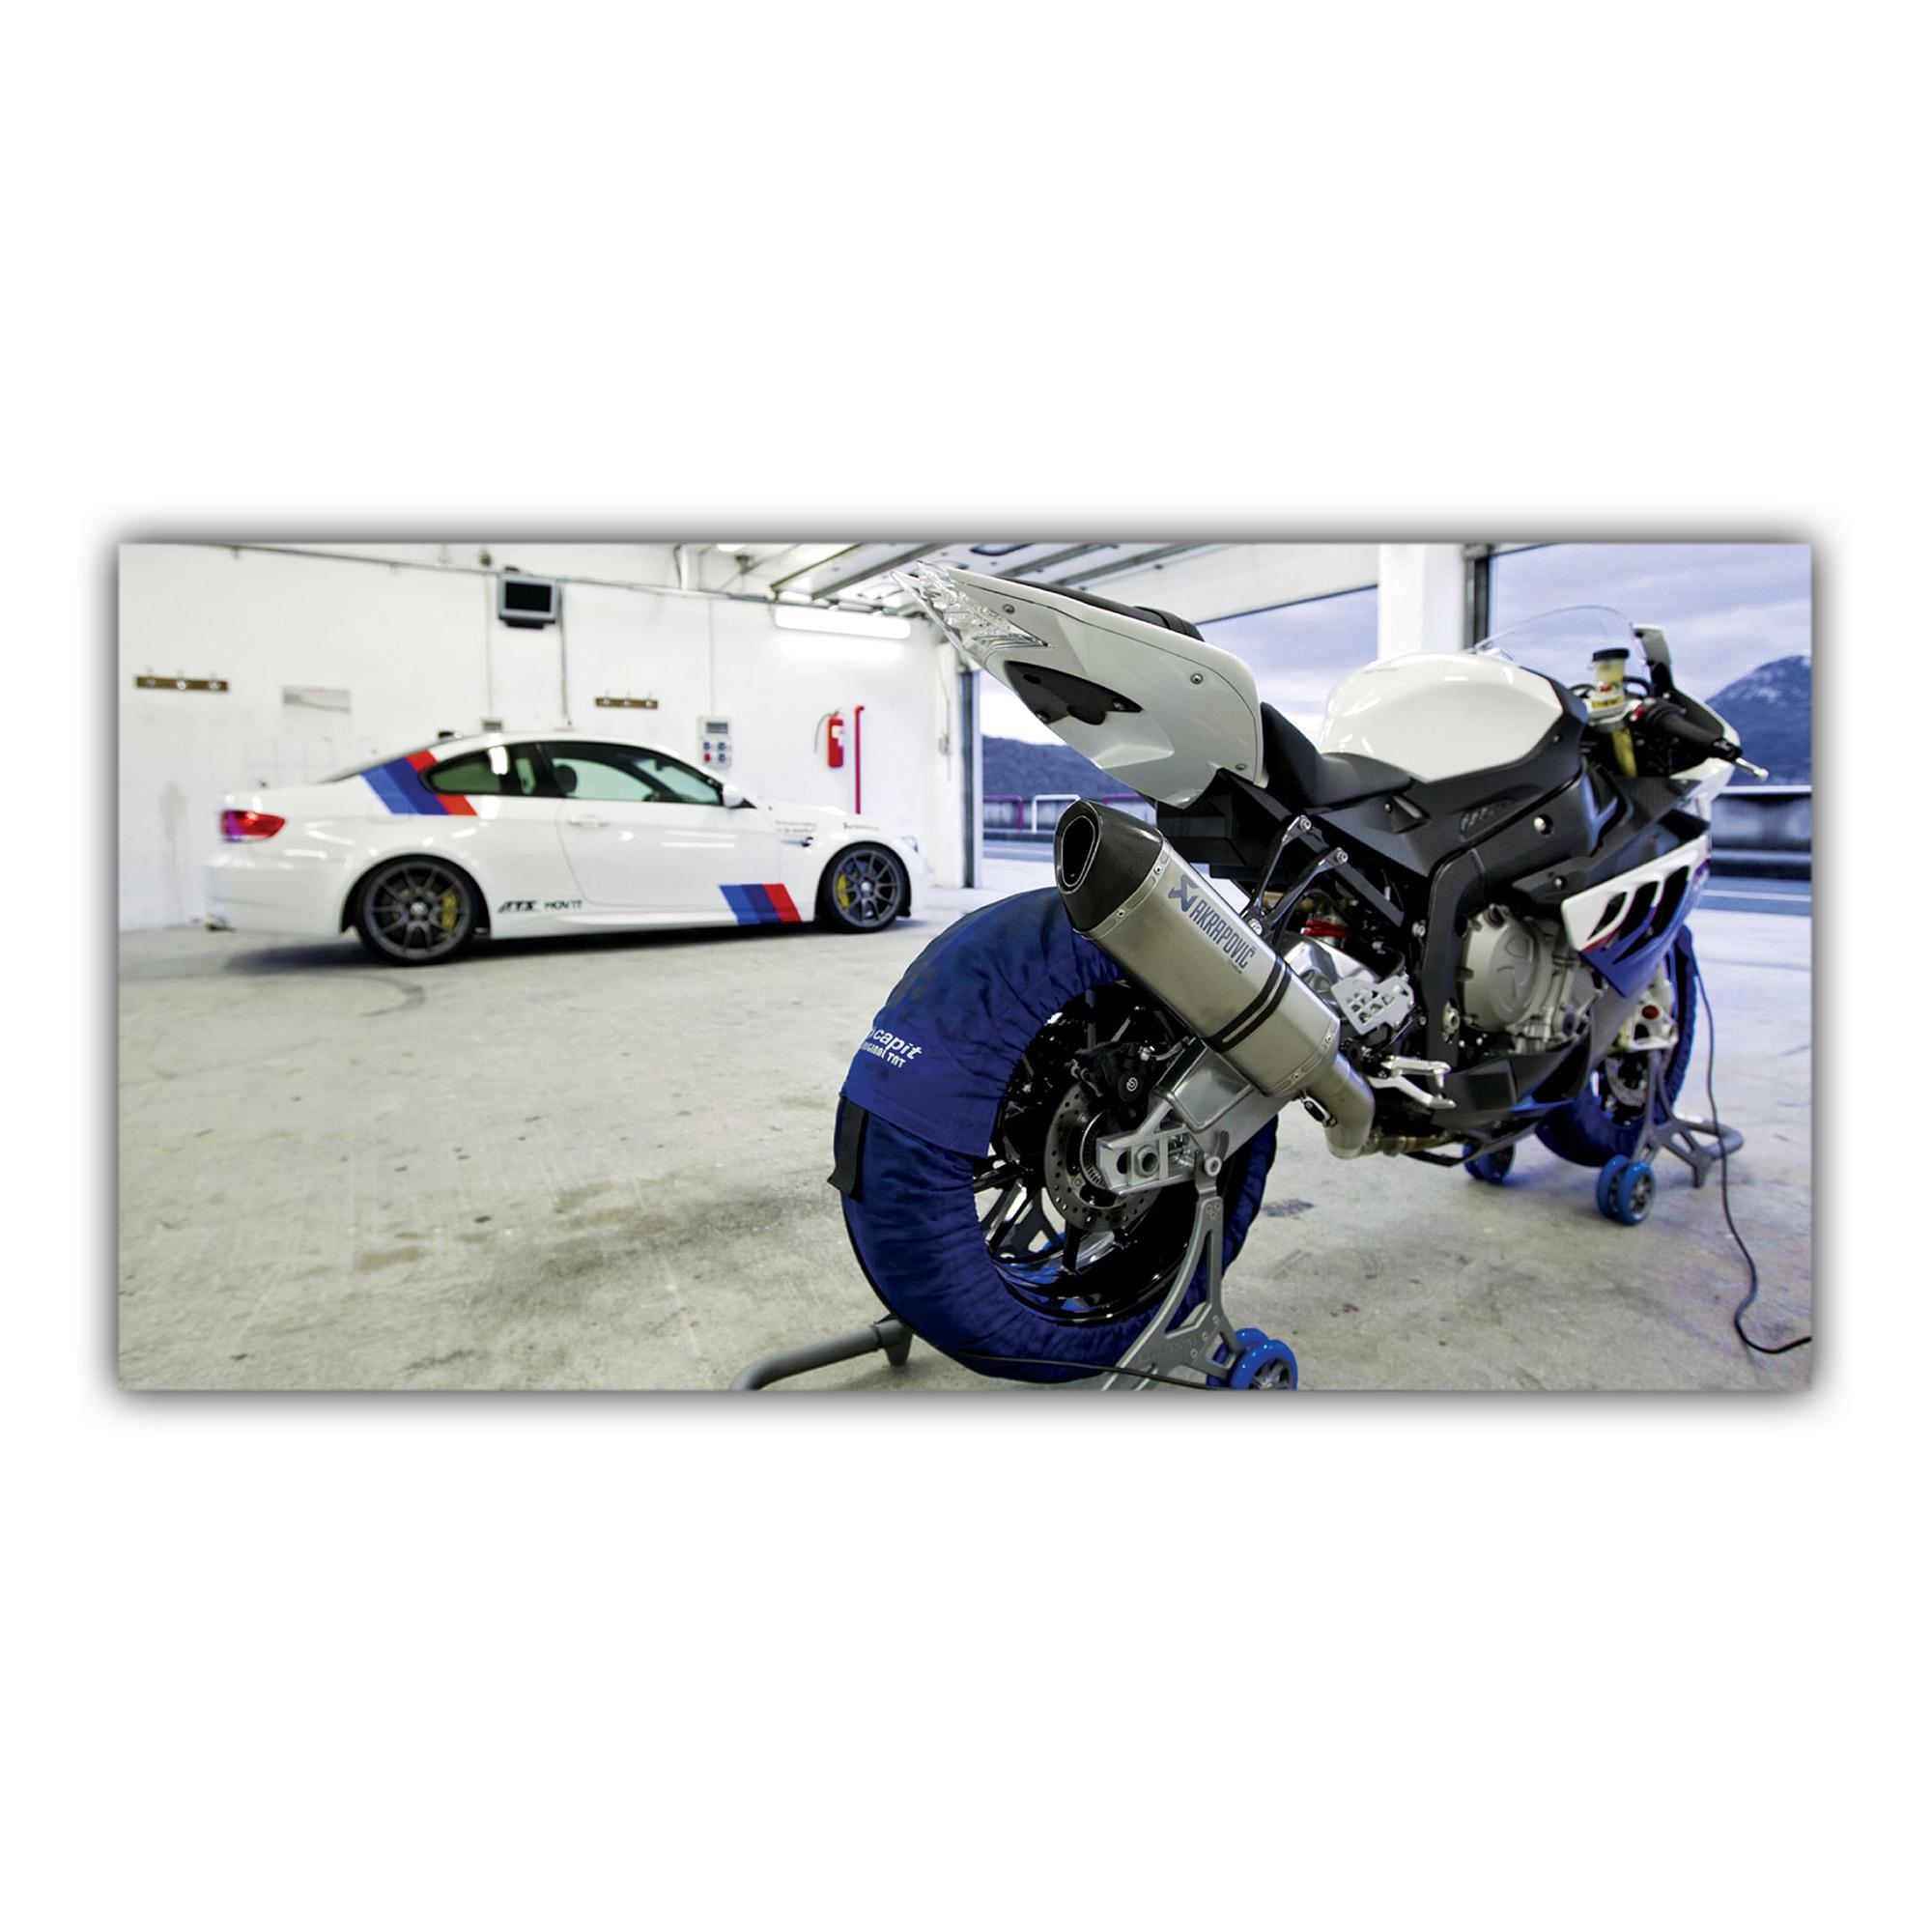 Motocyclette BMW S1000 RRMotocyclette BMW S1000 RR